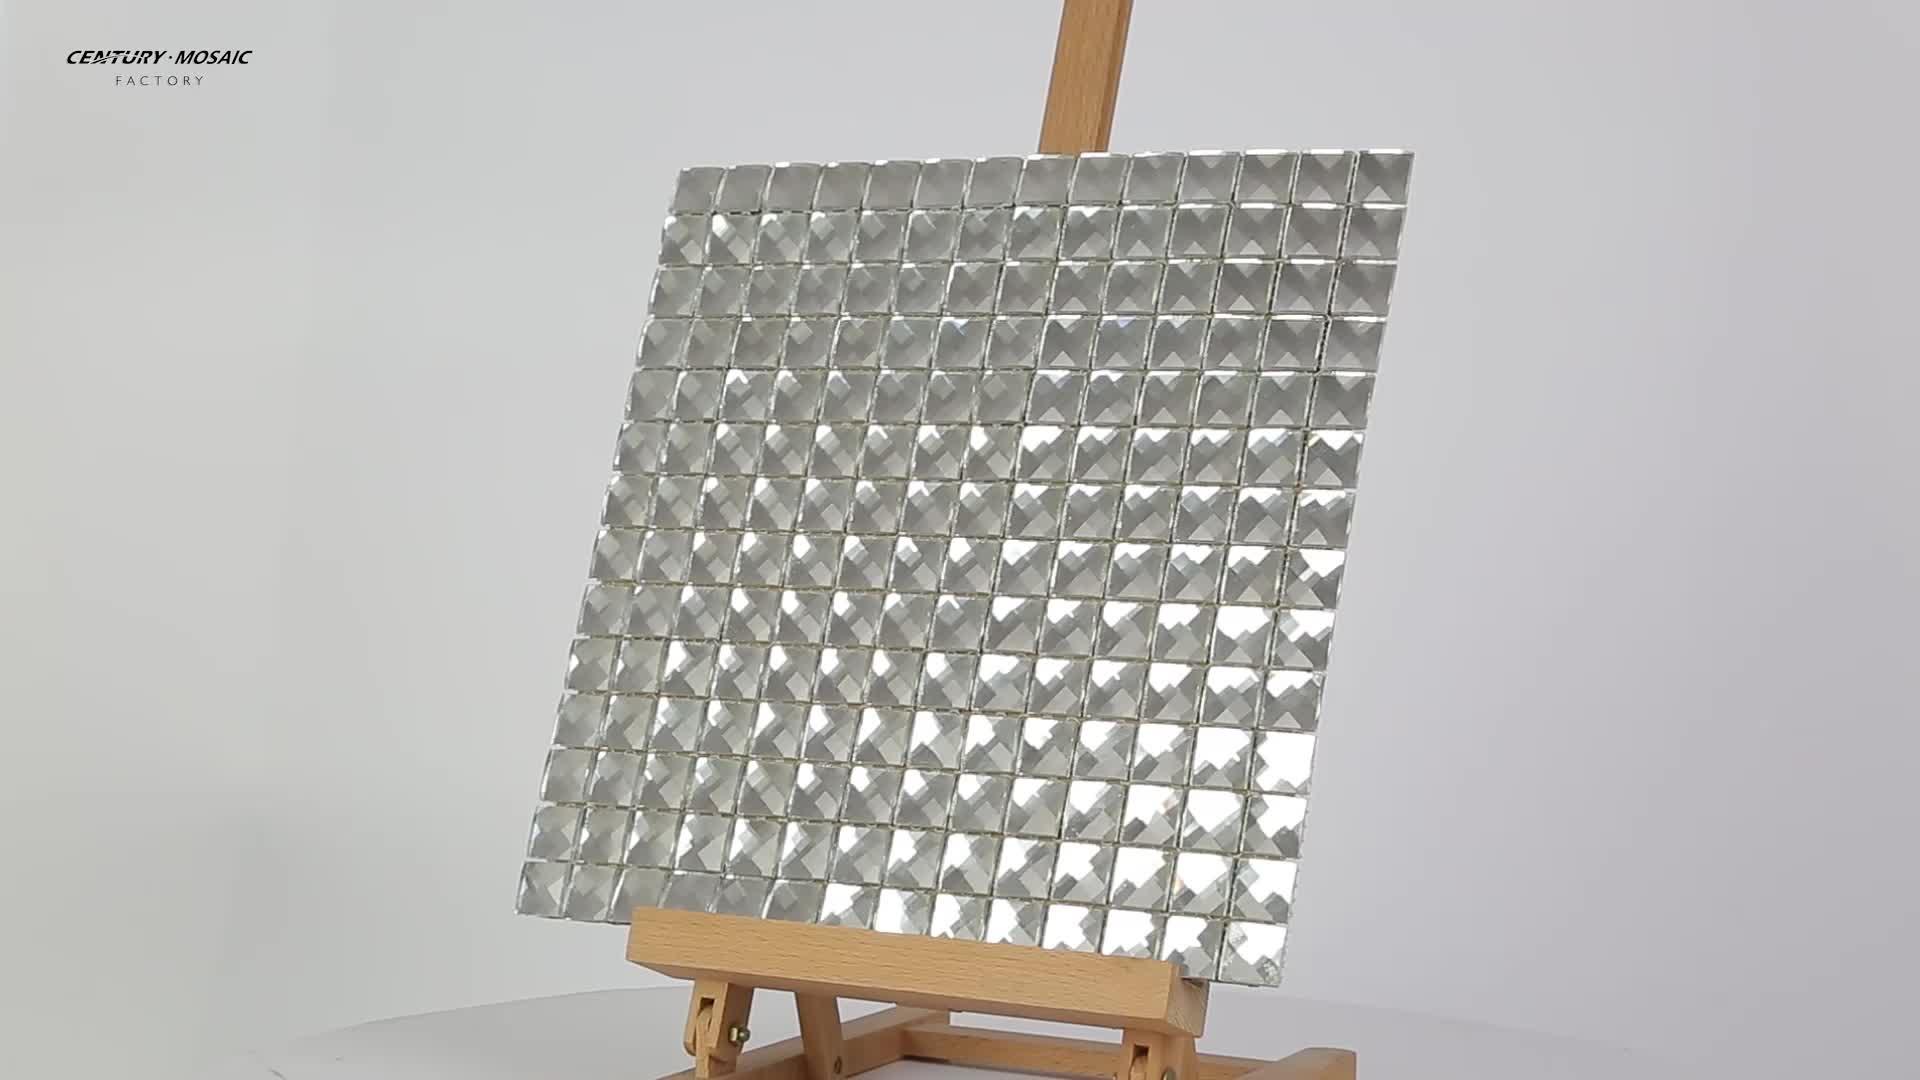 Trendy Backsplash Crystal Glass Mirror Mosaic Tiles